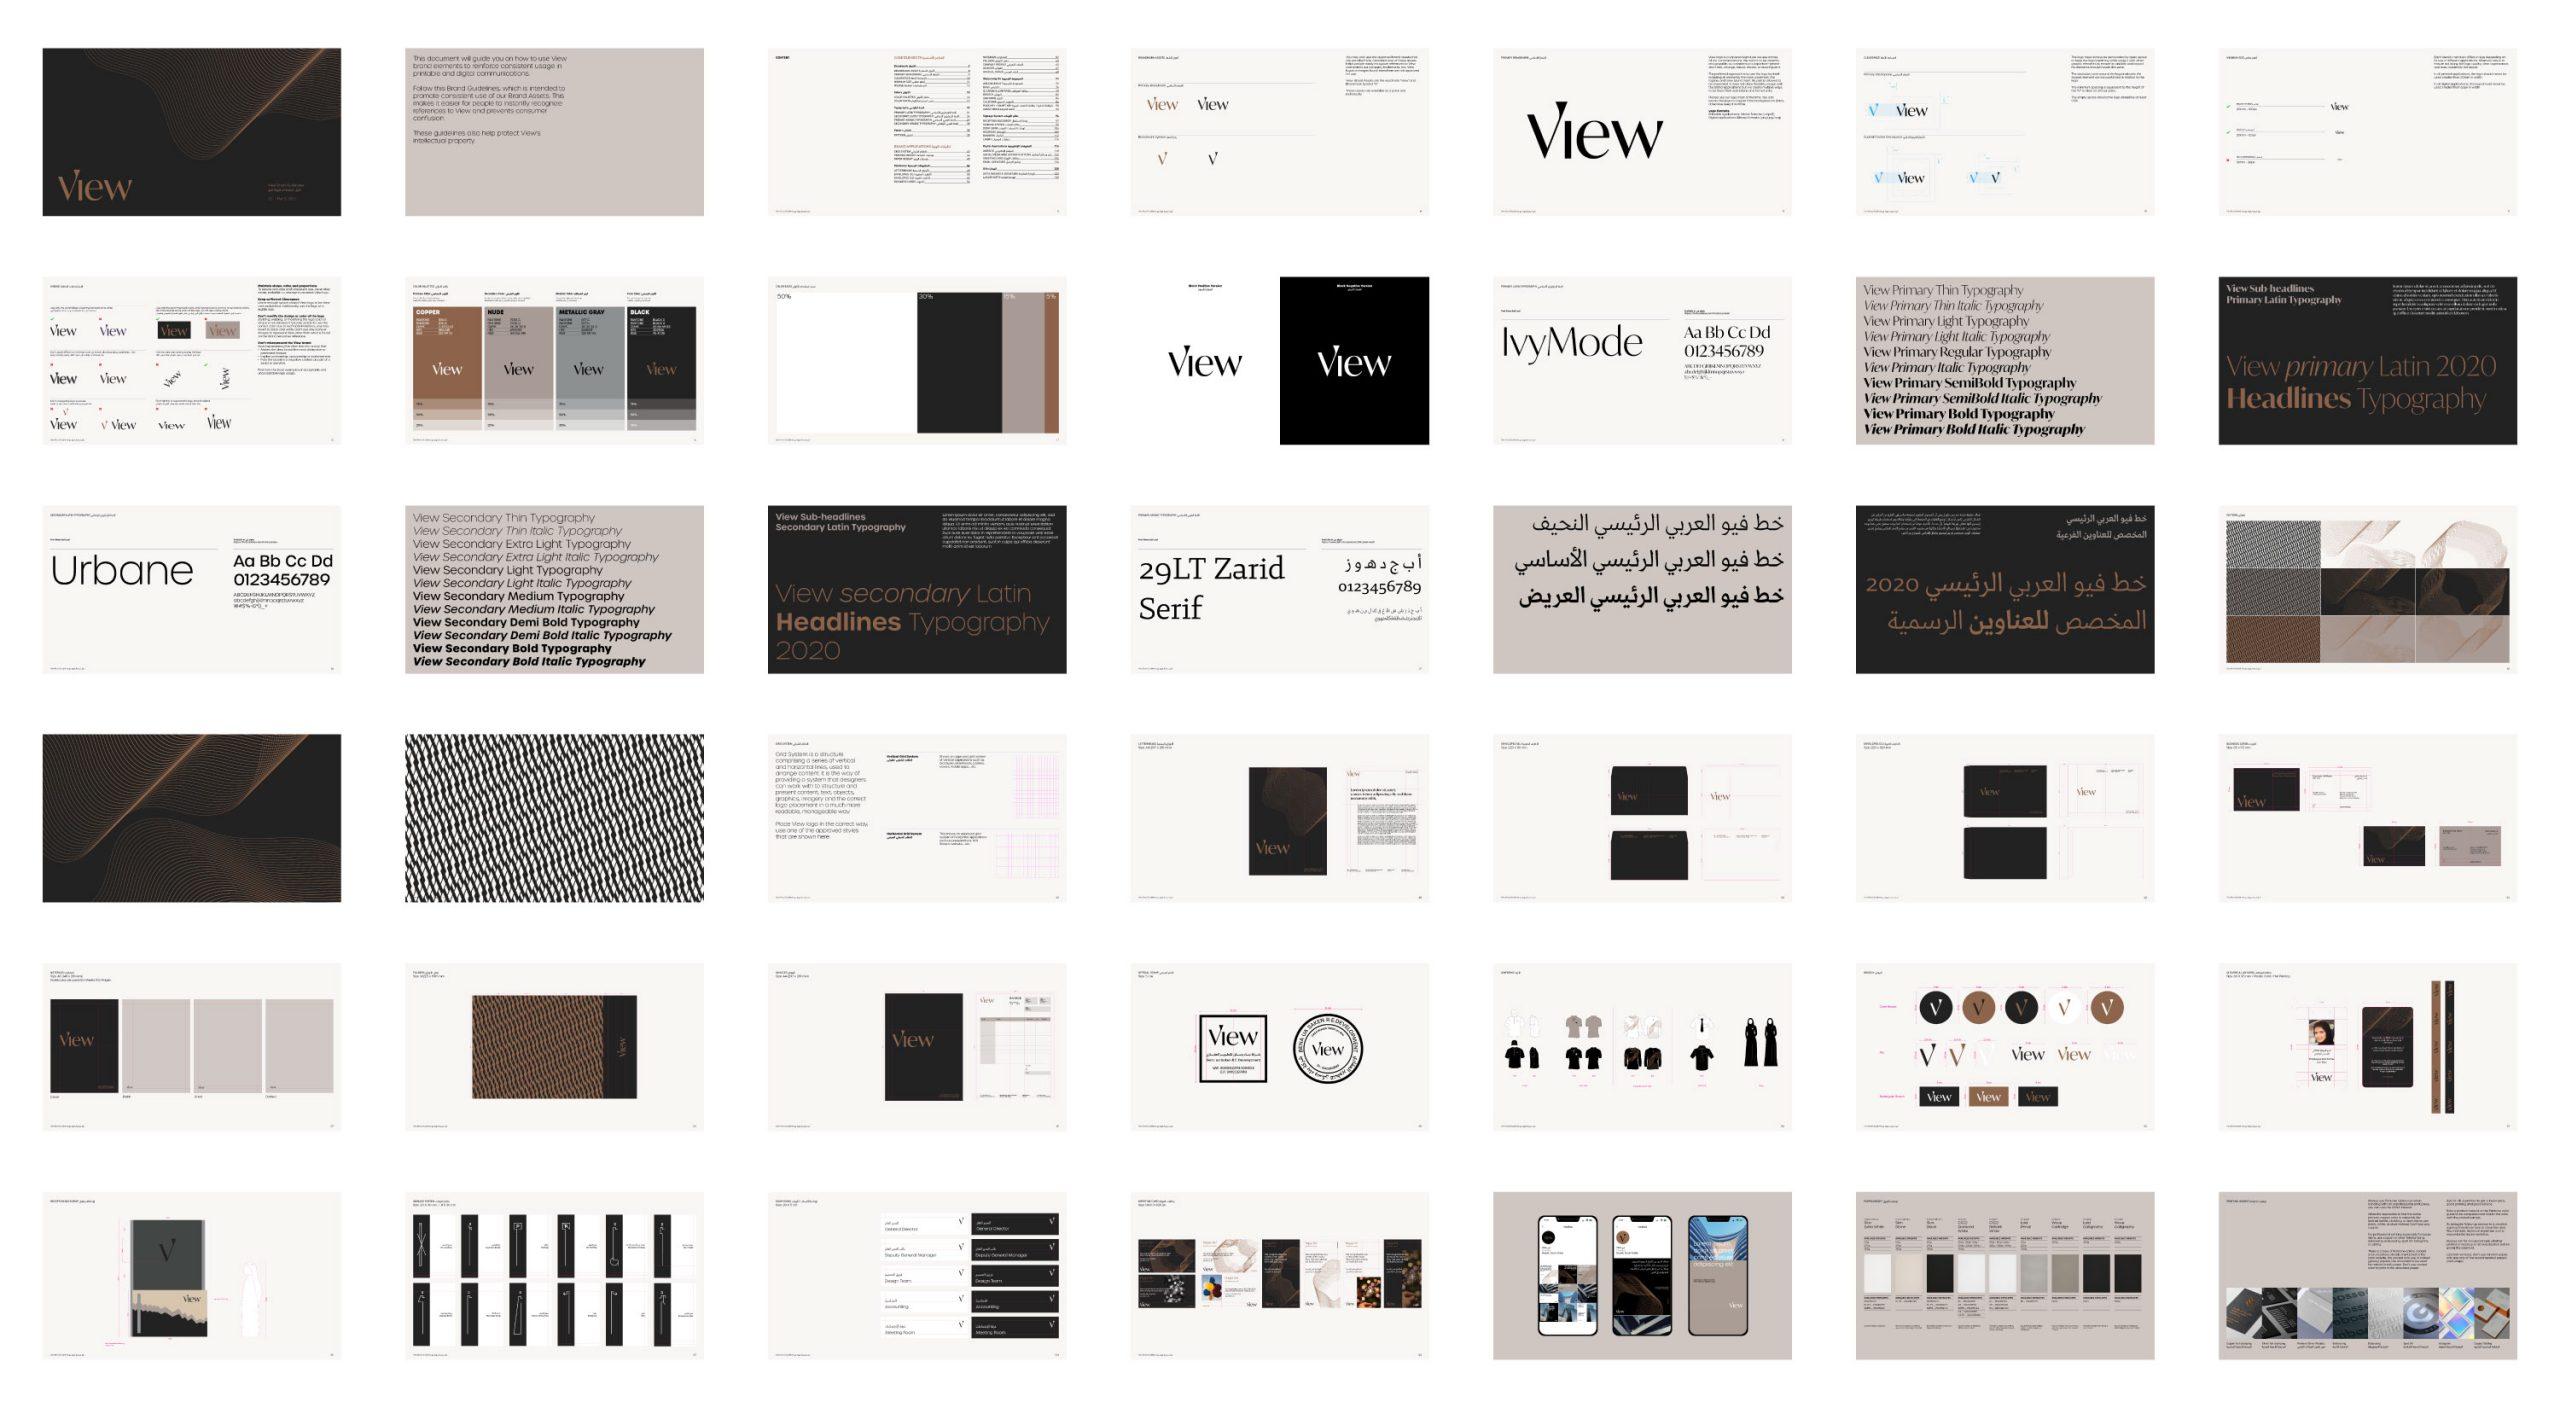 View-BrandGuidelines-Work-by-YaStudio-20